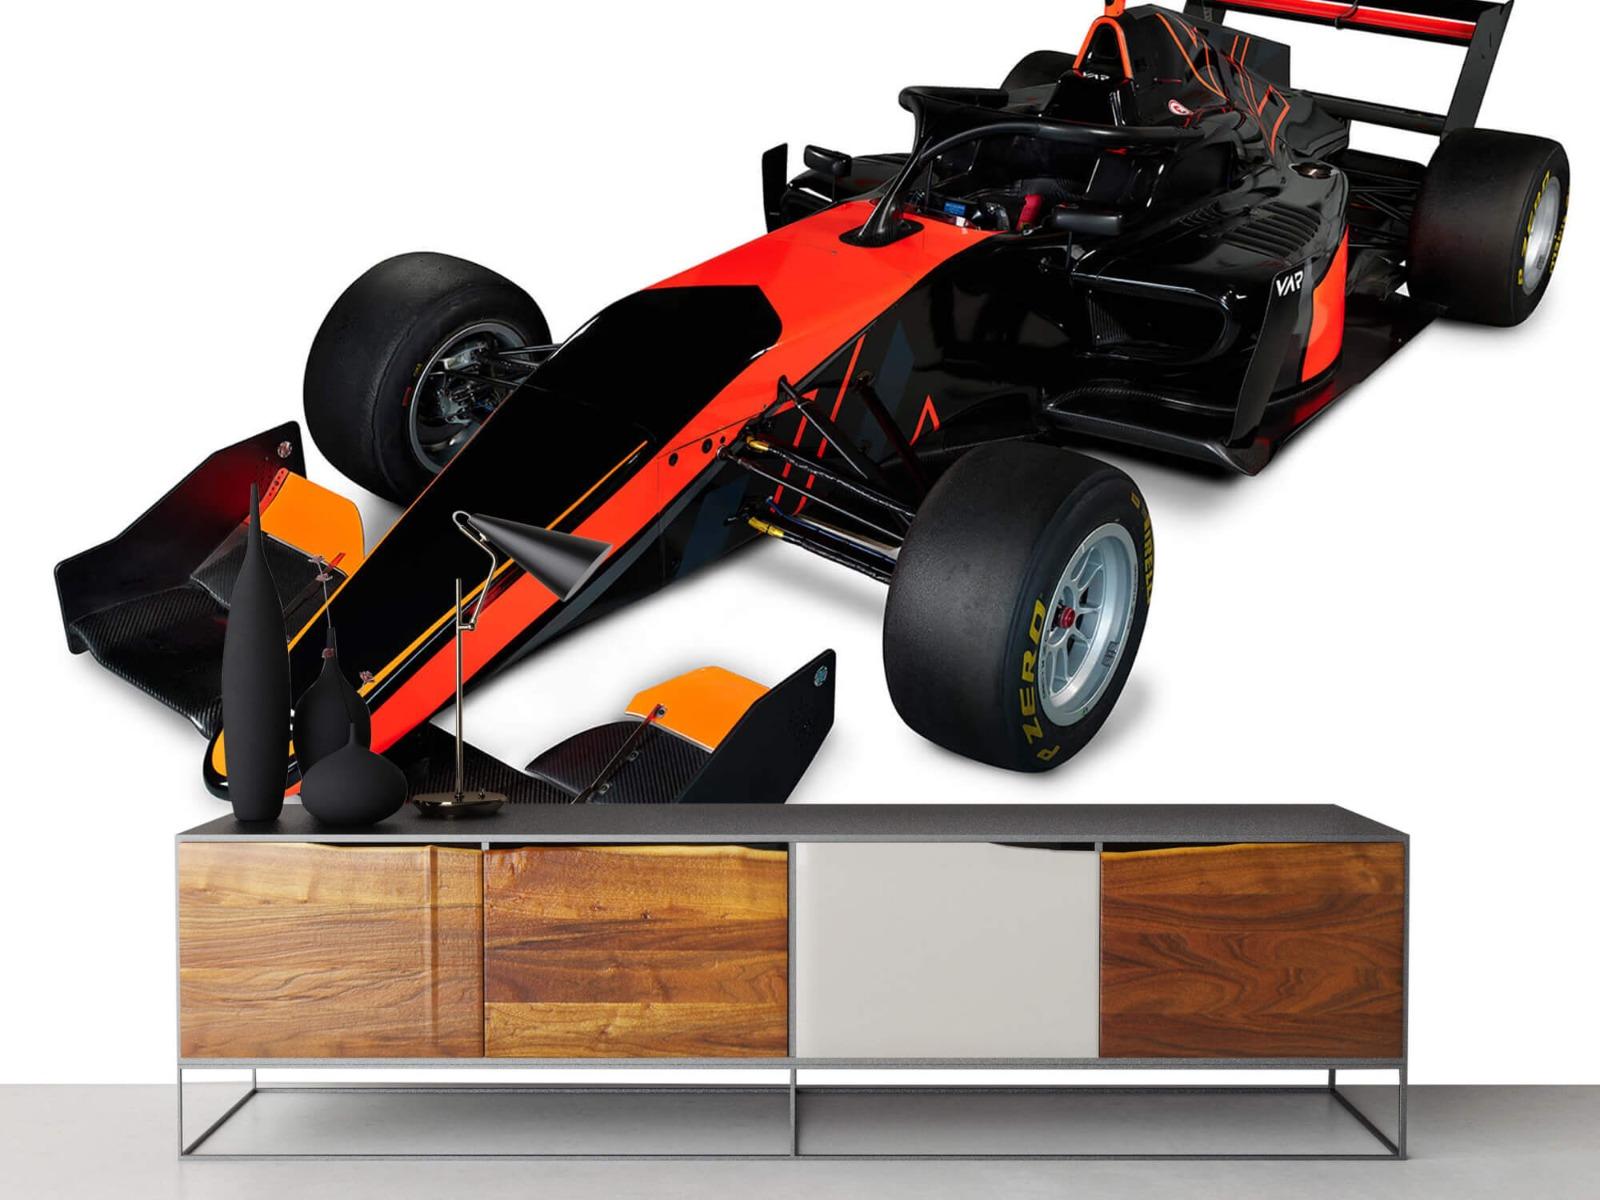 Sportauto's - Formula 3 - Left front view, 3d - Computerruimte 17